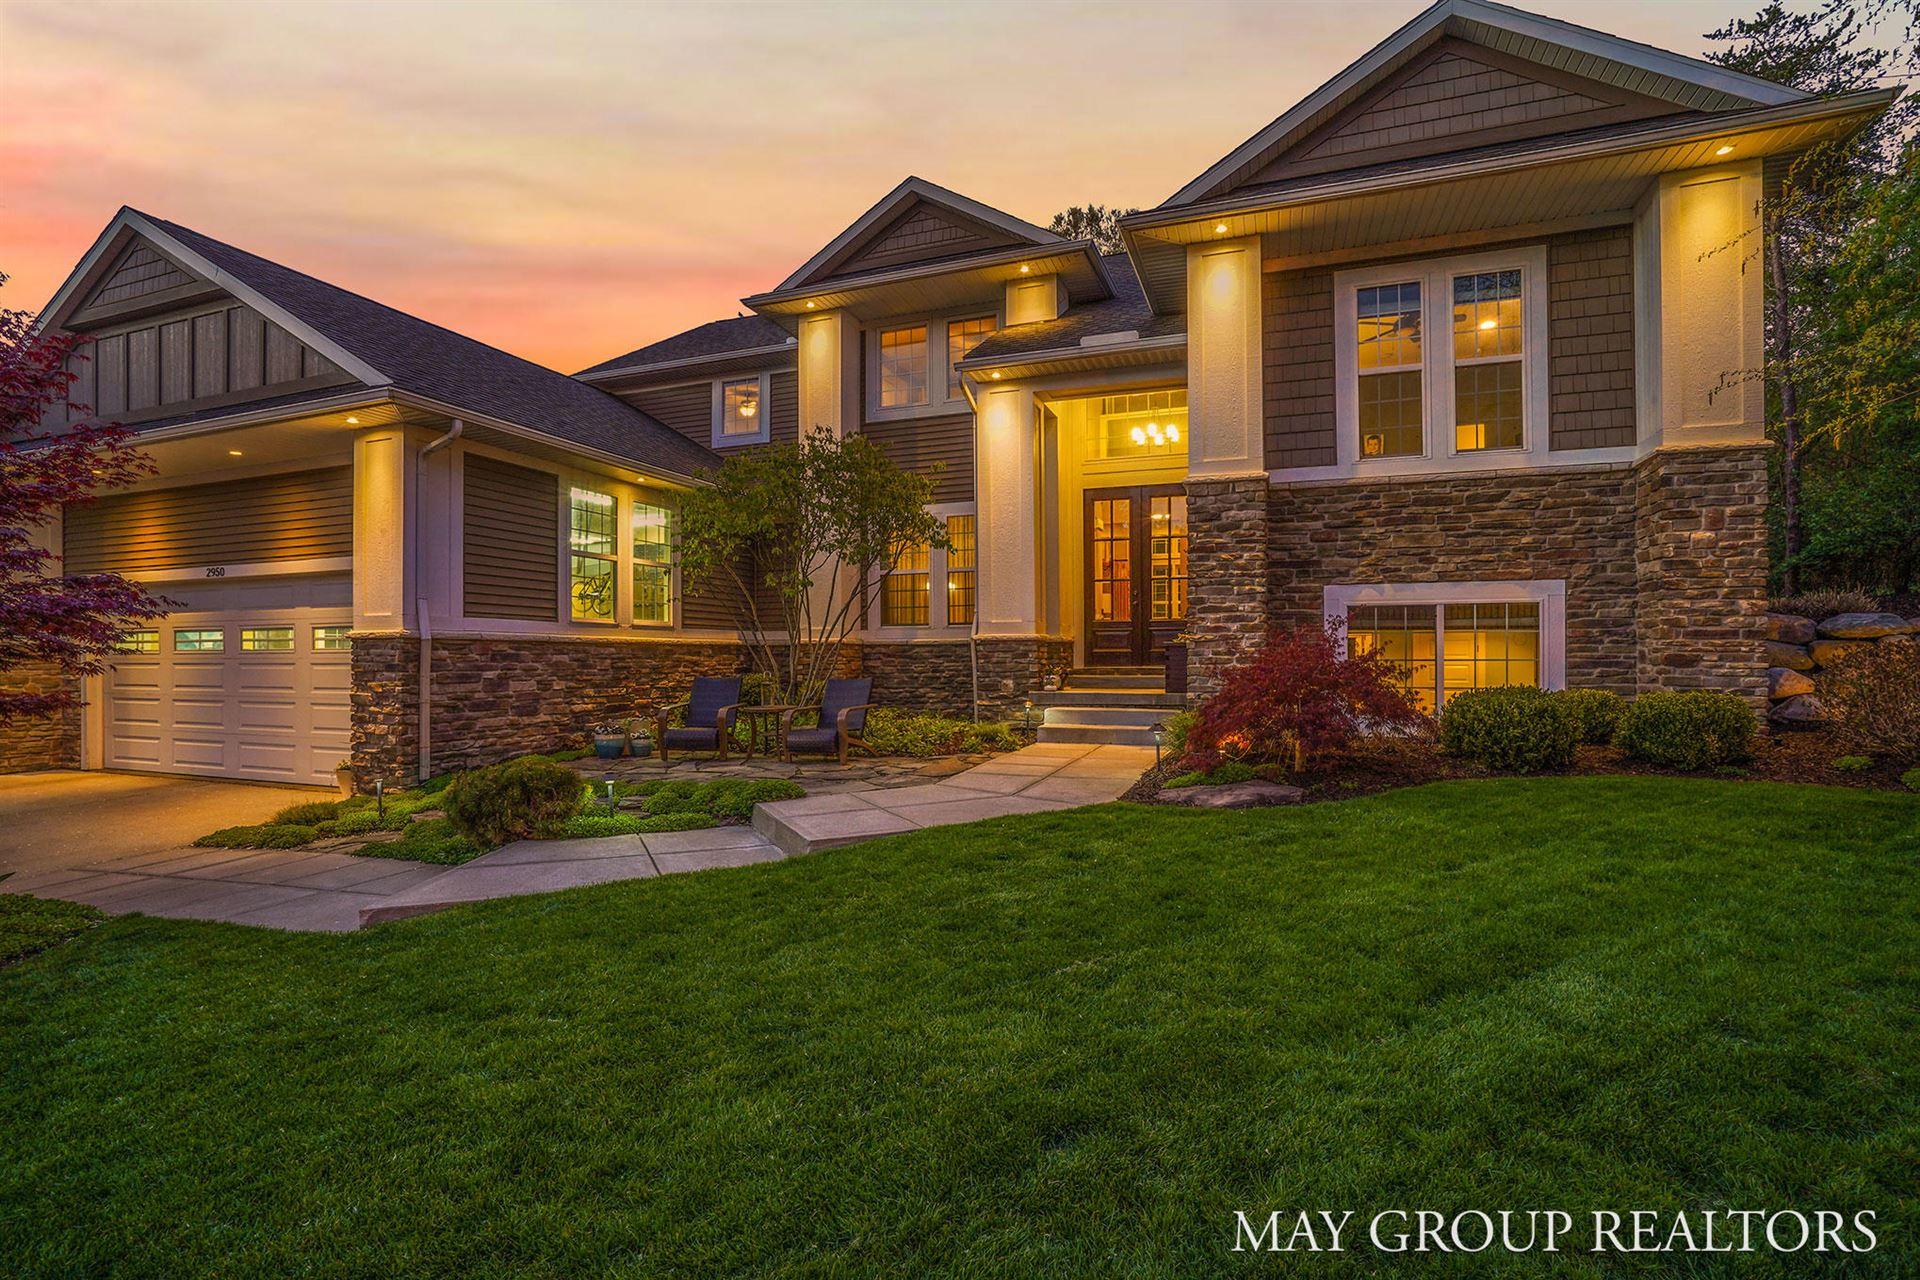 2950 Coppergrove Drive NE, Grand Rapids, MI 49525 - MLS#: 21015843